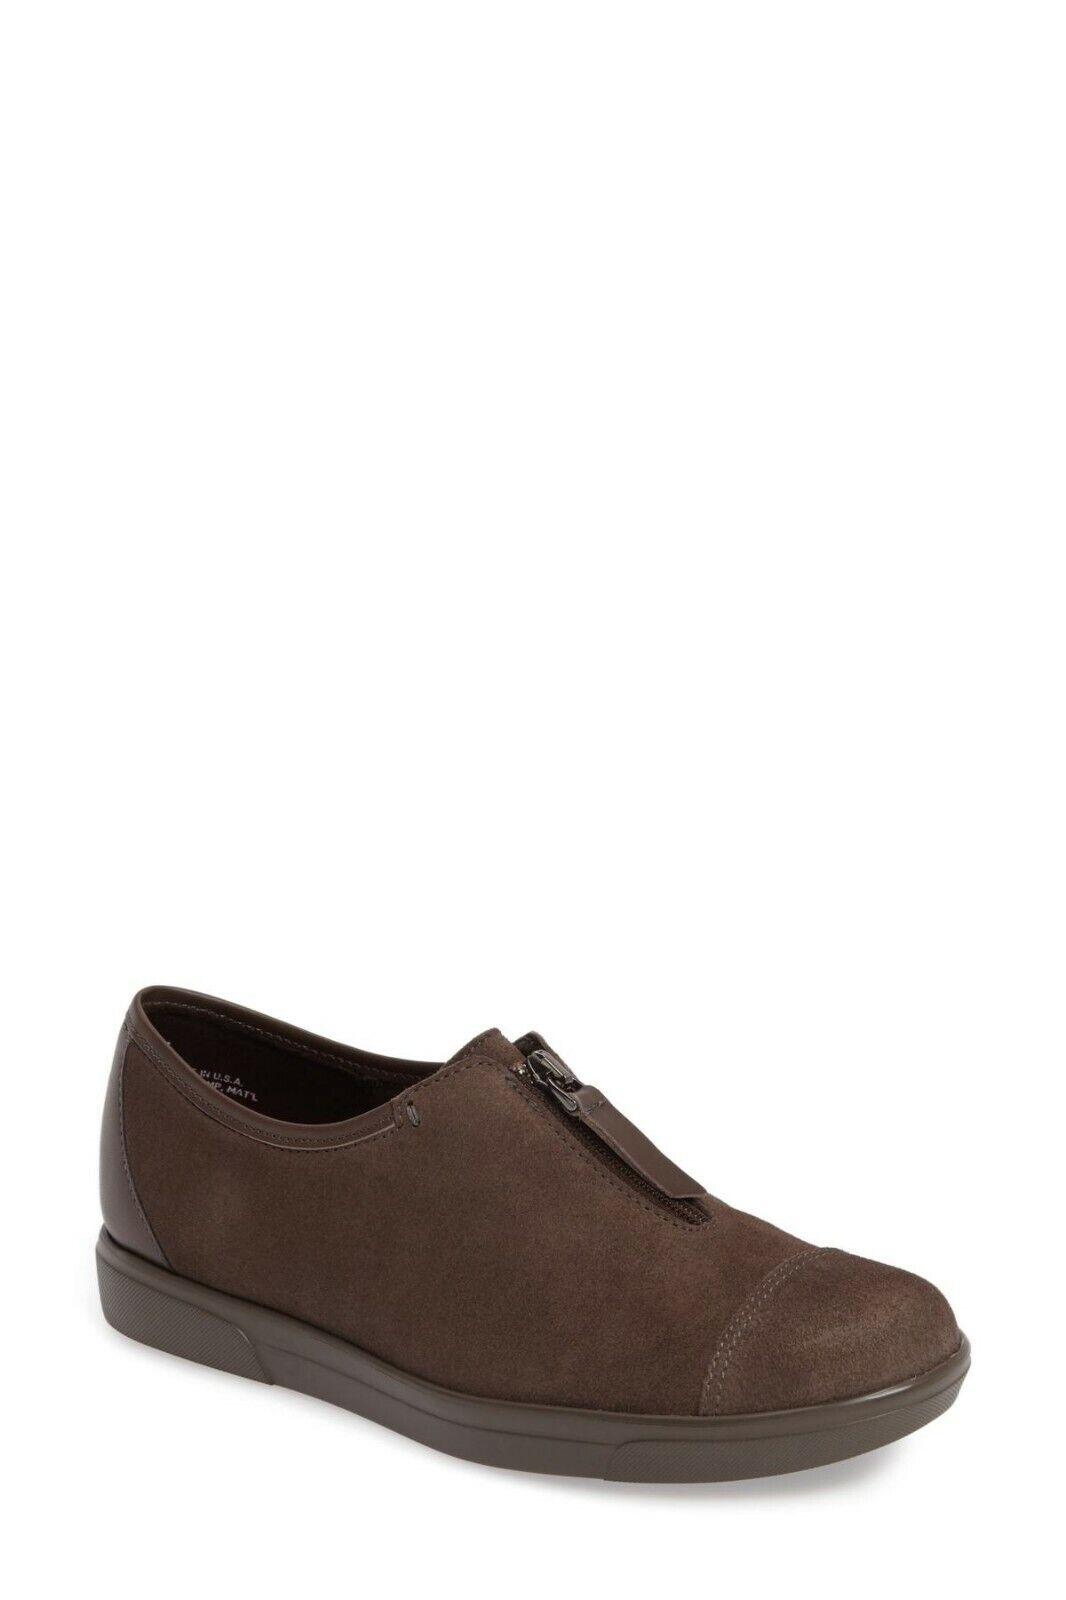 NEW Munro Roslyn Zip Sneaker, Taupe Suede, Size Women 9 M  215